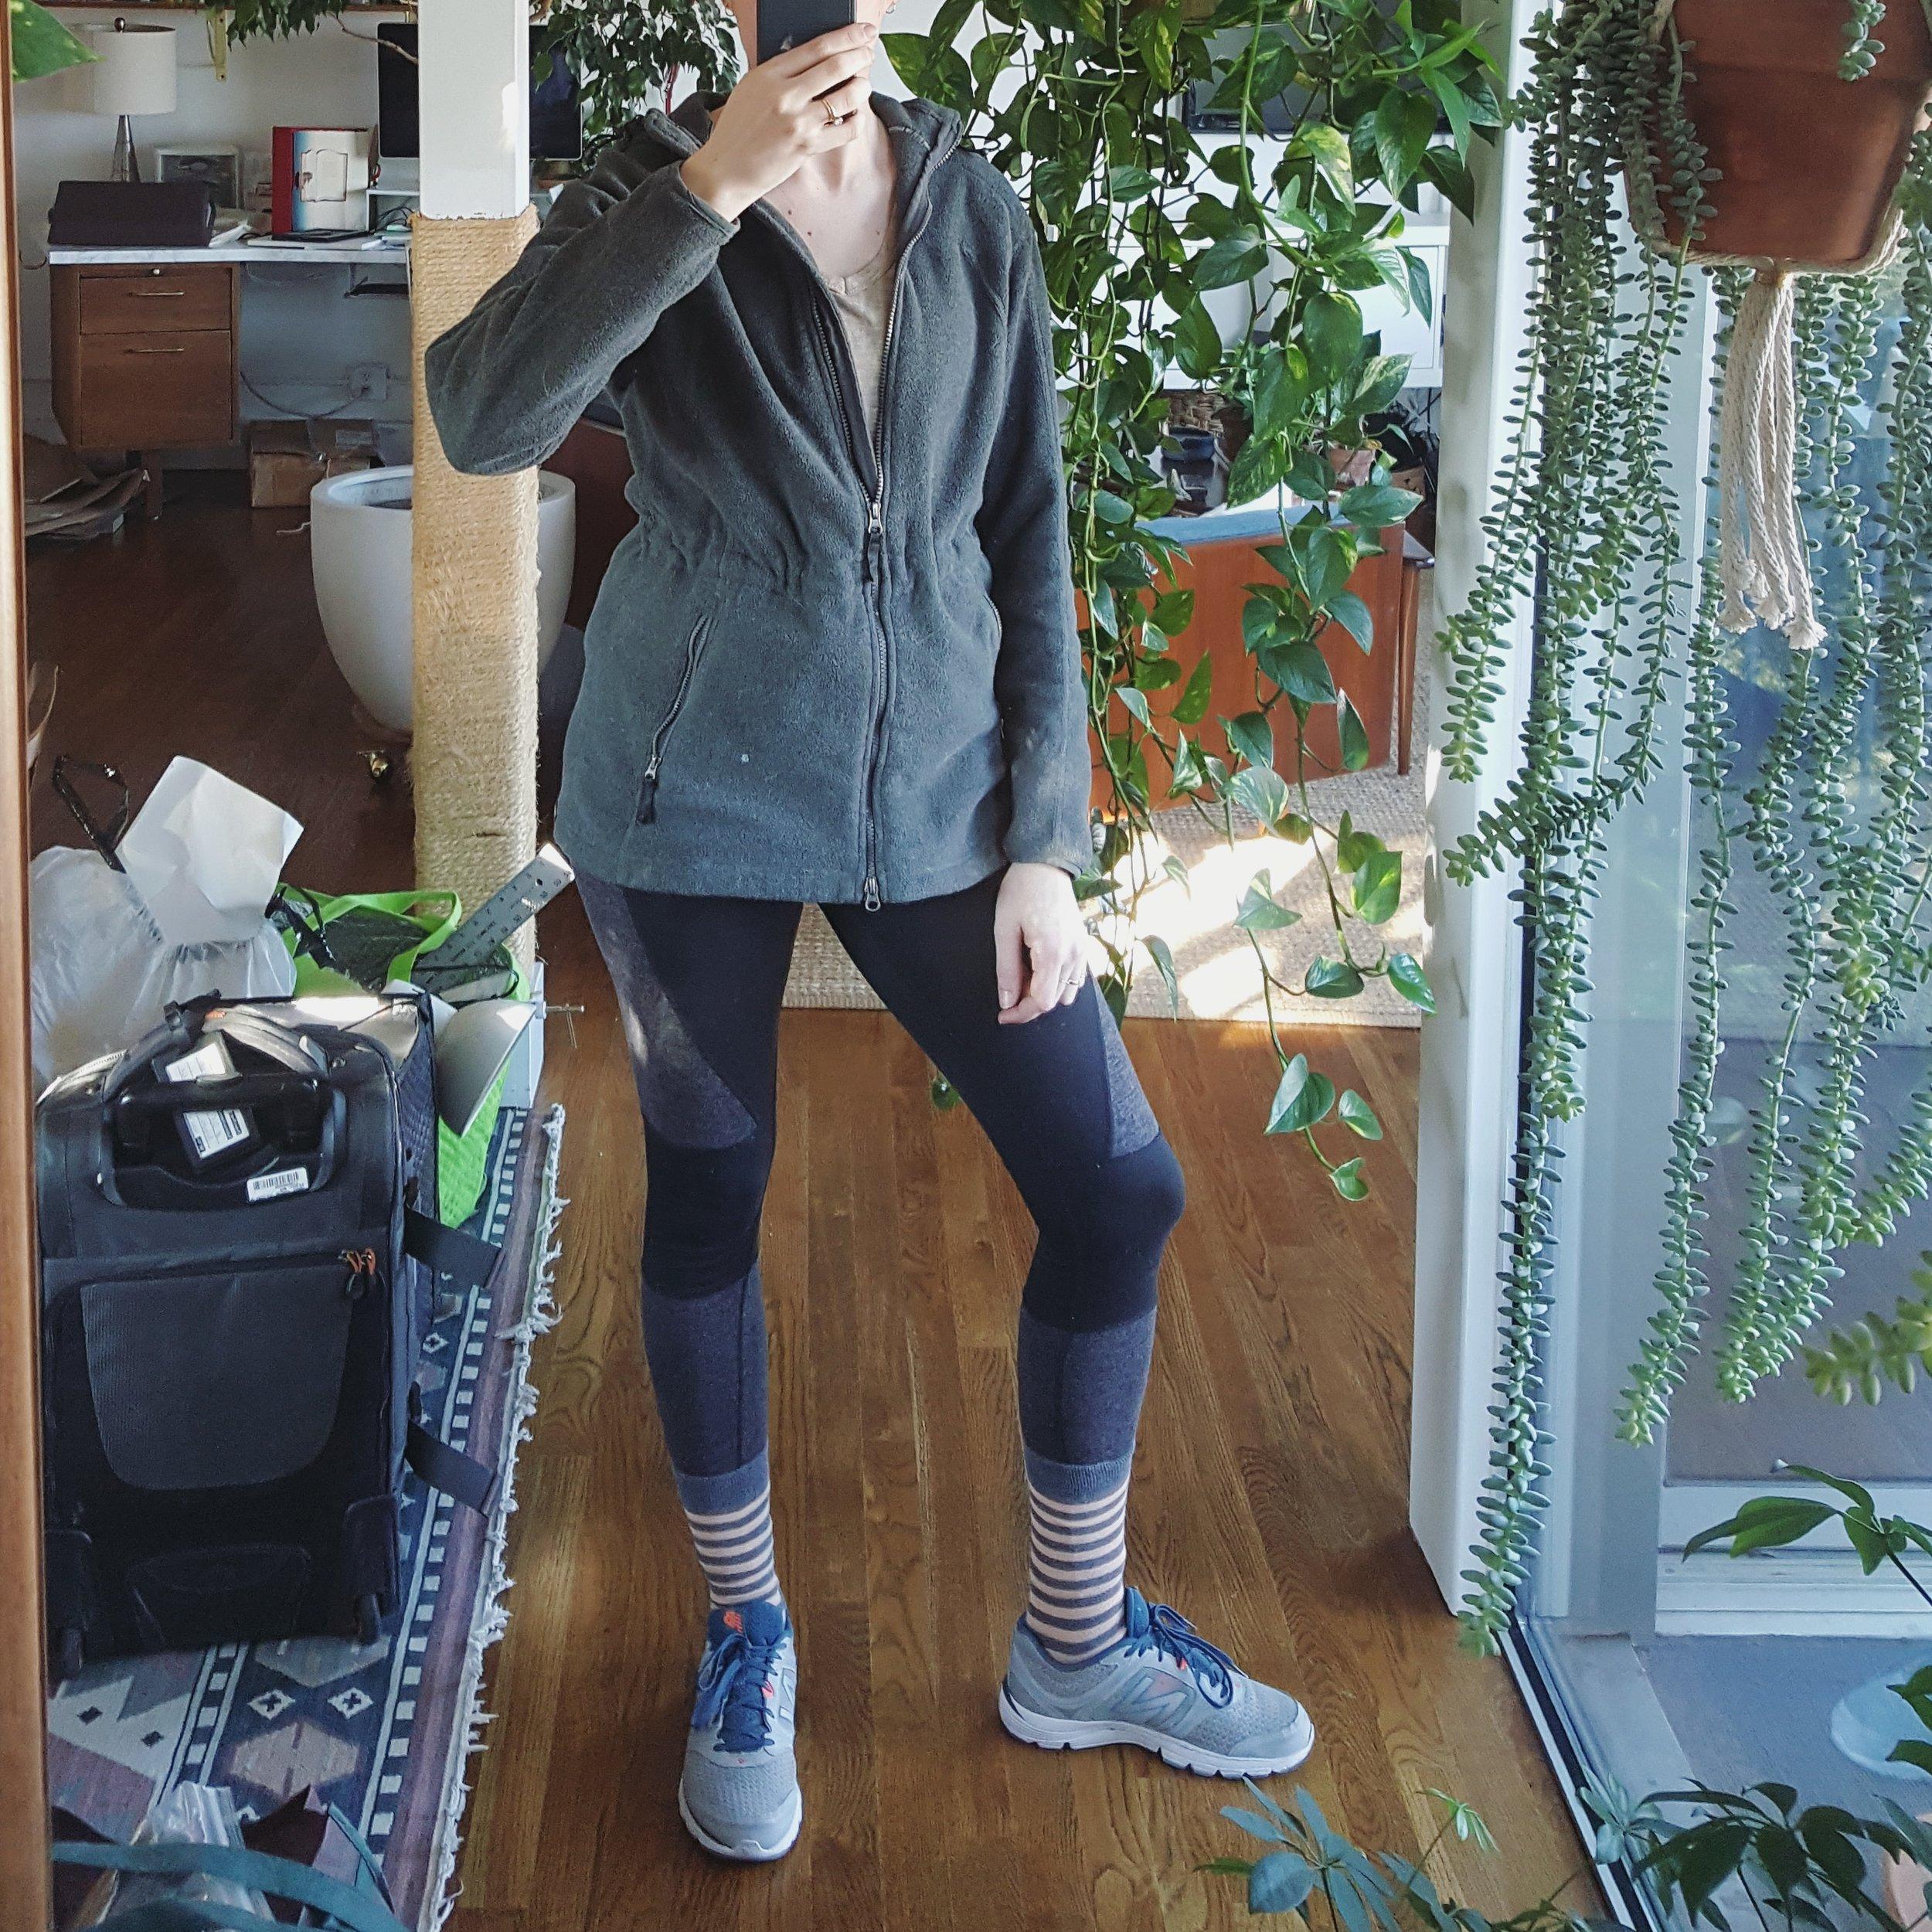 Friday - December 29, 2017Fleece lined leggings + Alternative Apparel tee + fleece hoodie + New Balance sneaks